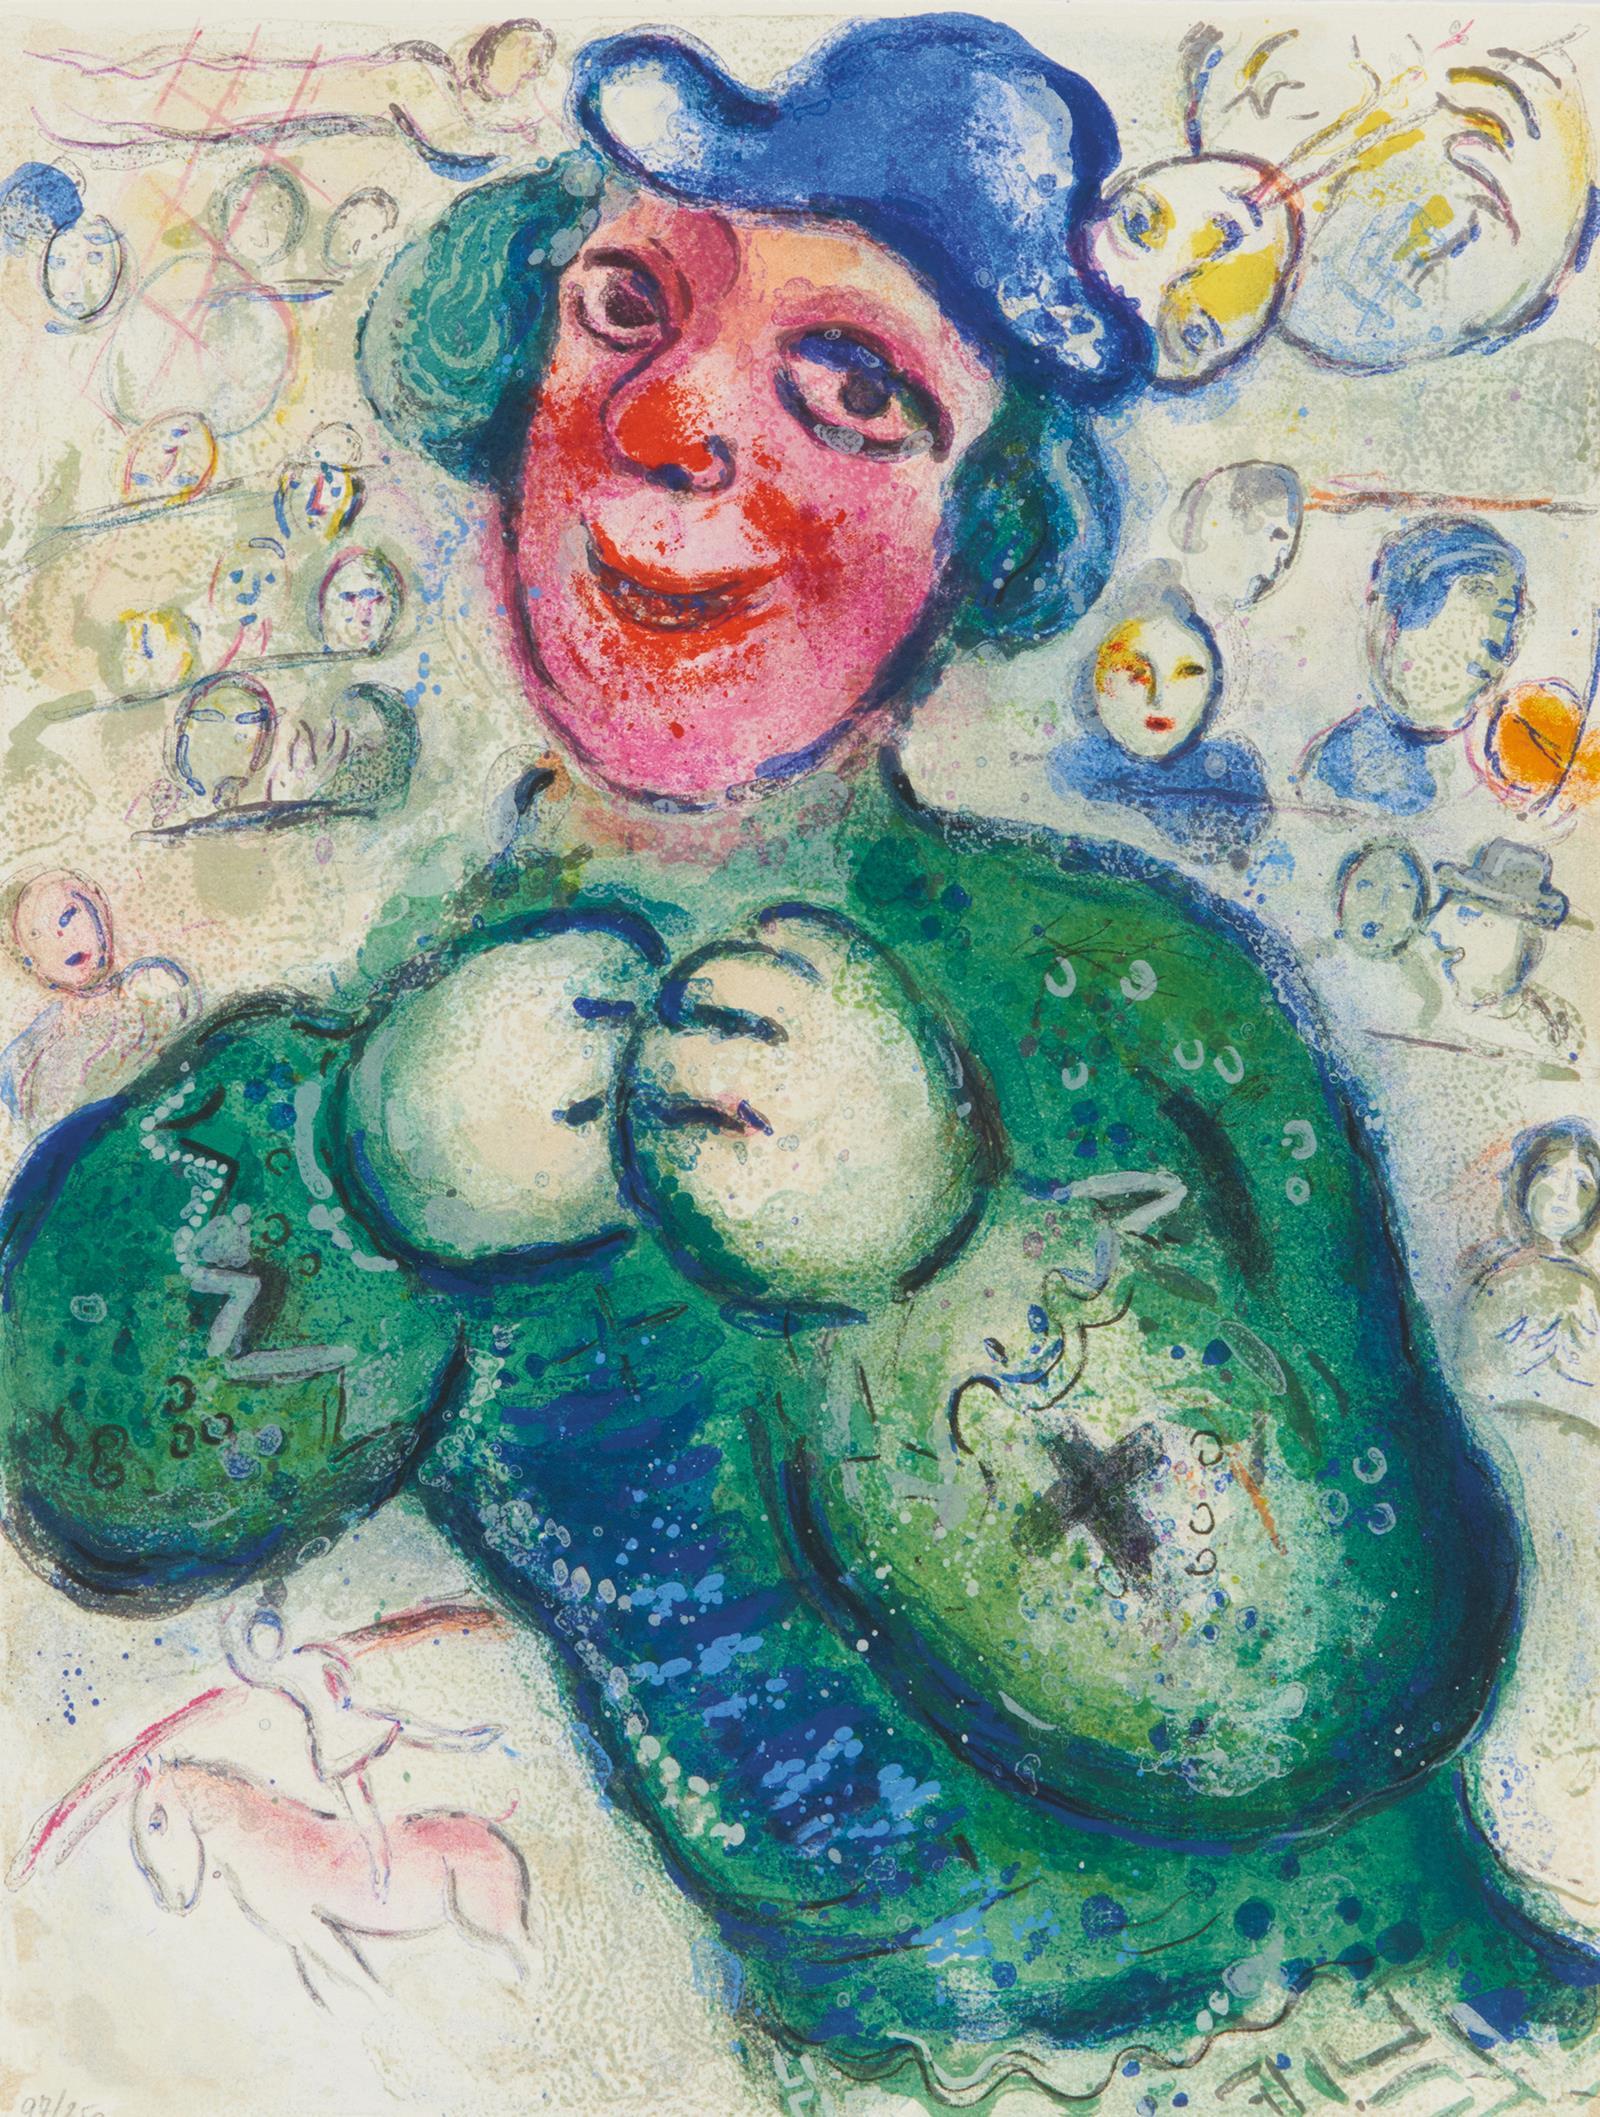 Source: Auktionshaus Kiefer